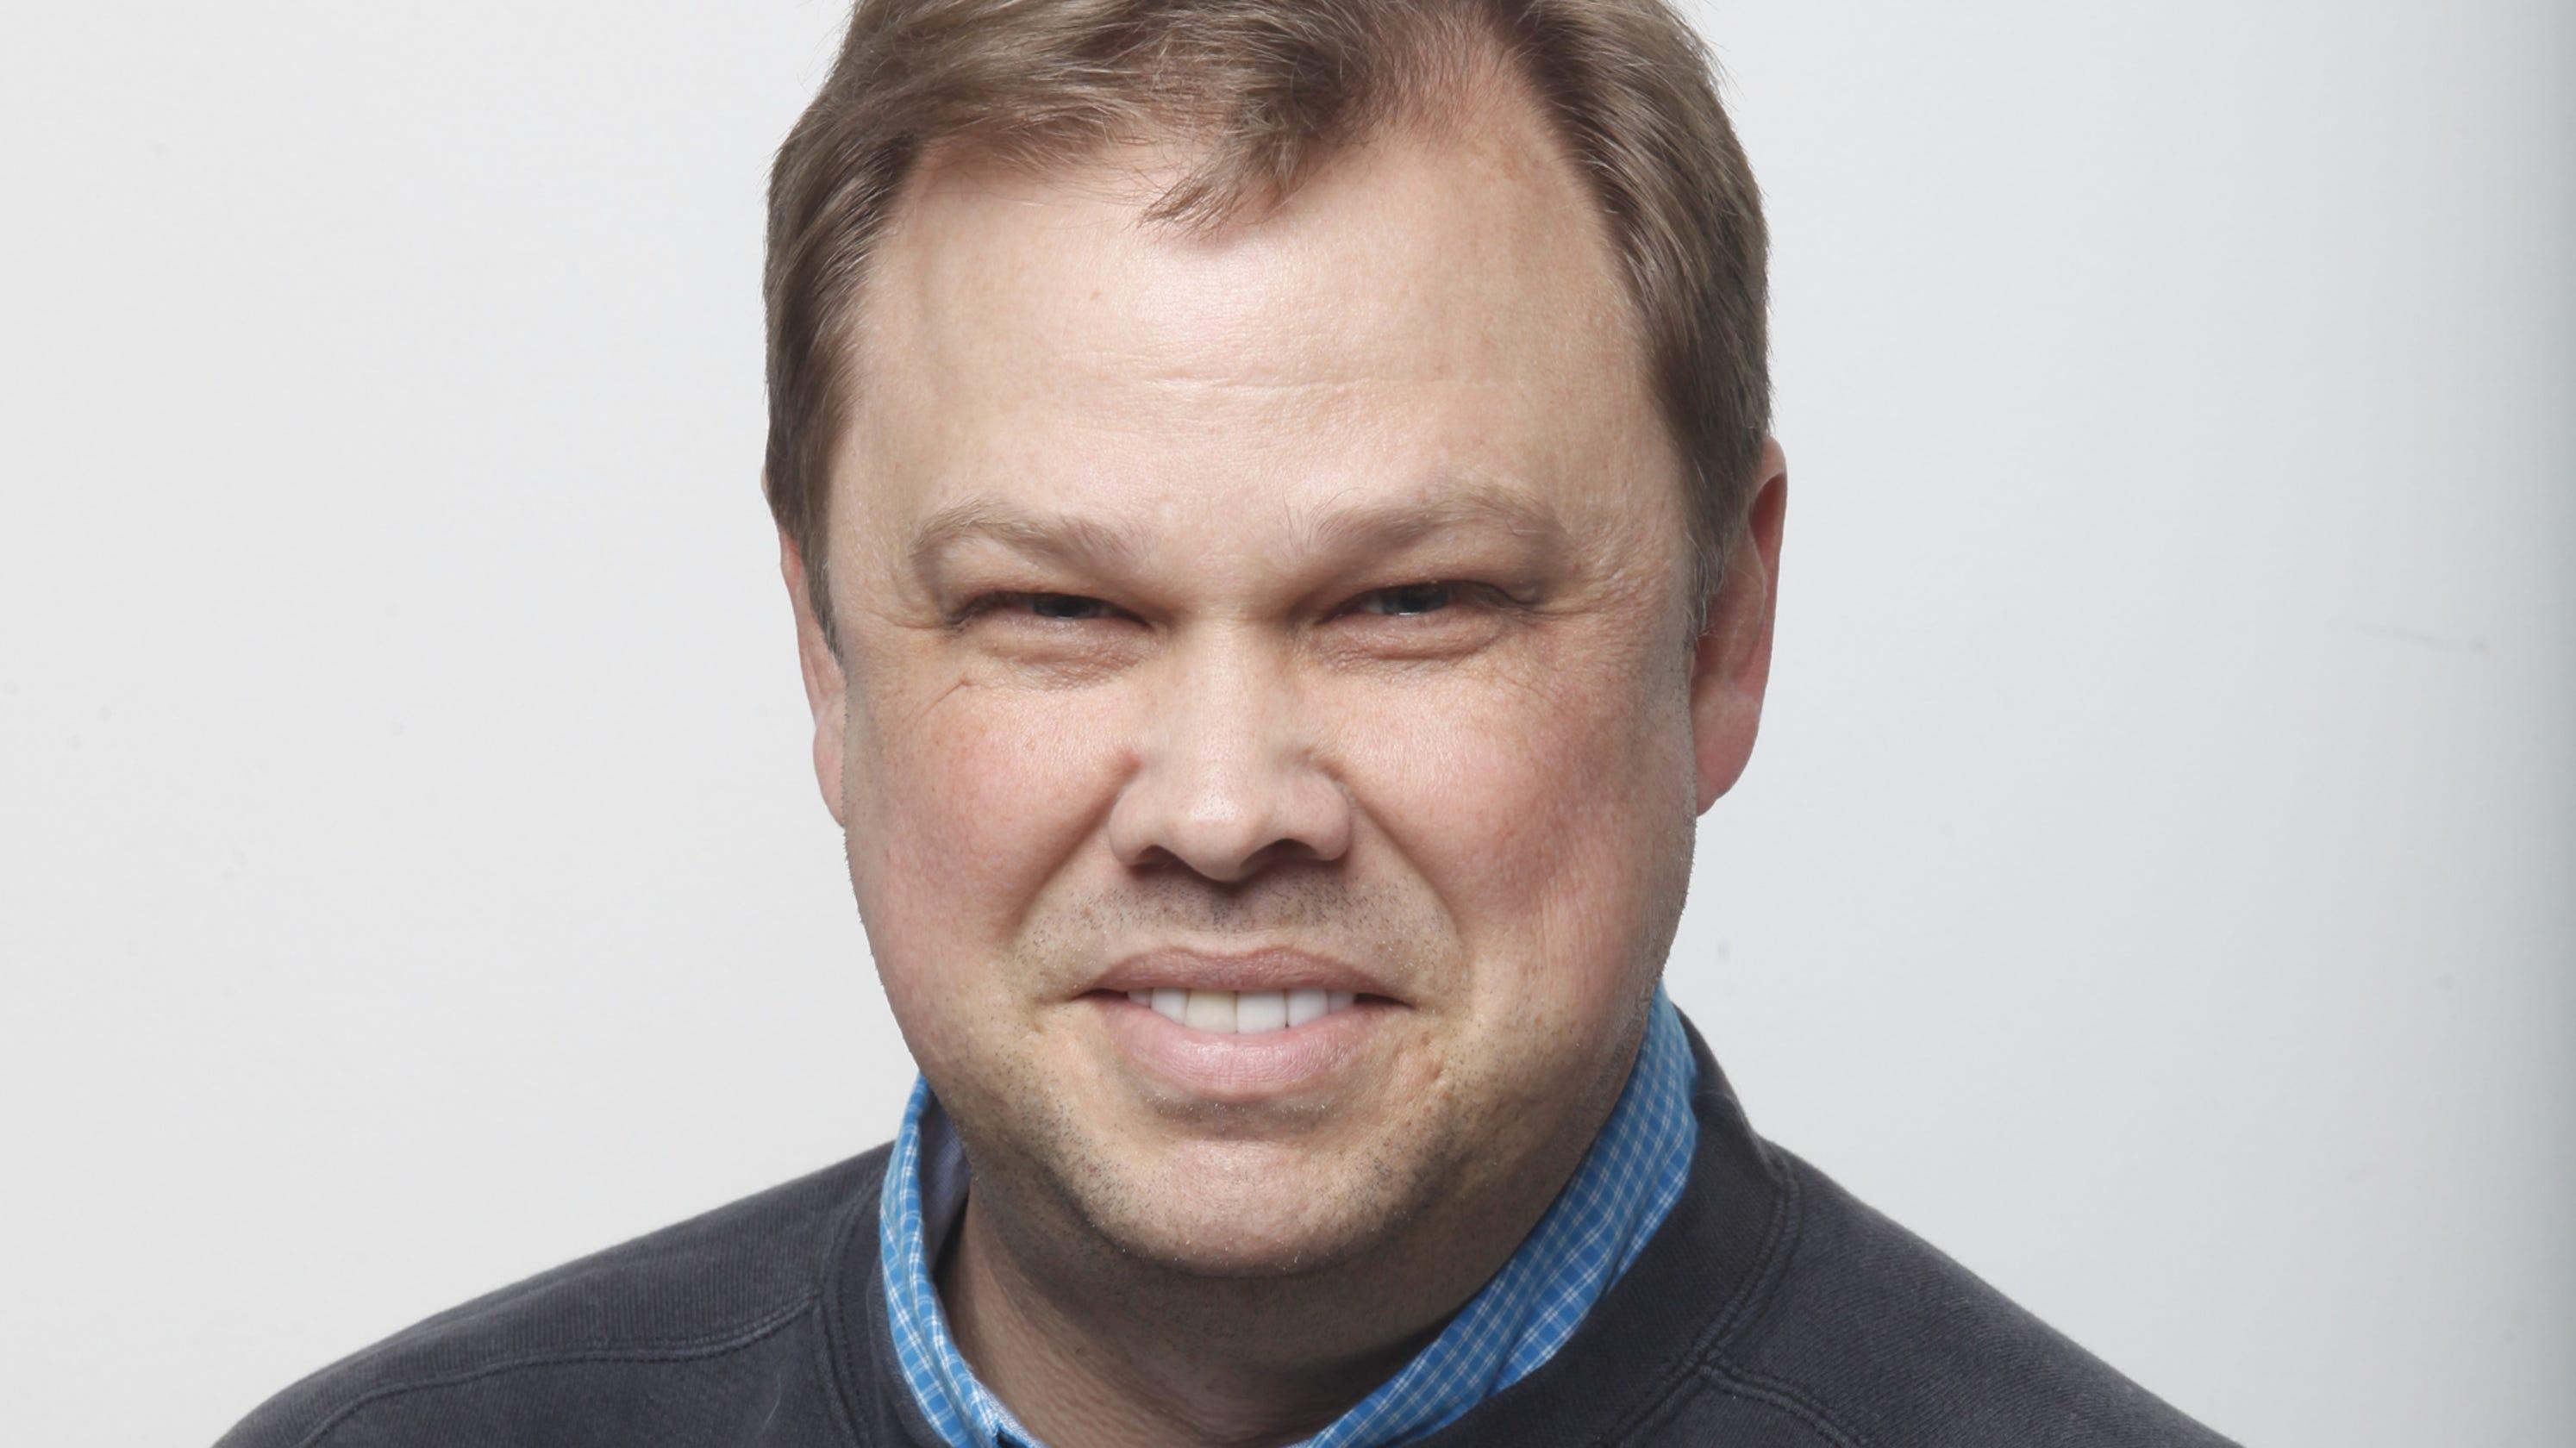 Louisville WDRB columnist Eric Crawford suffers stroke